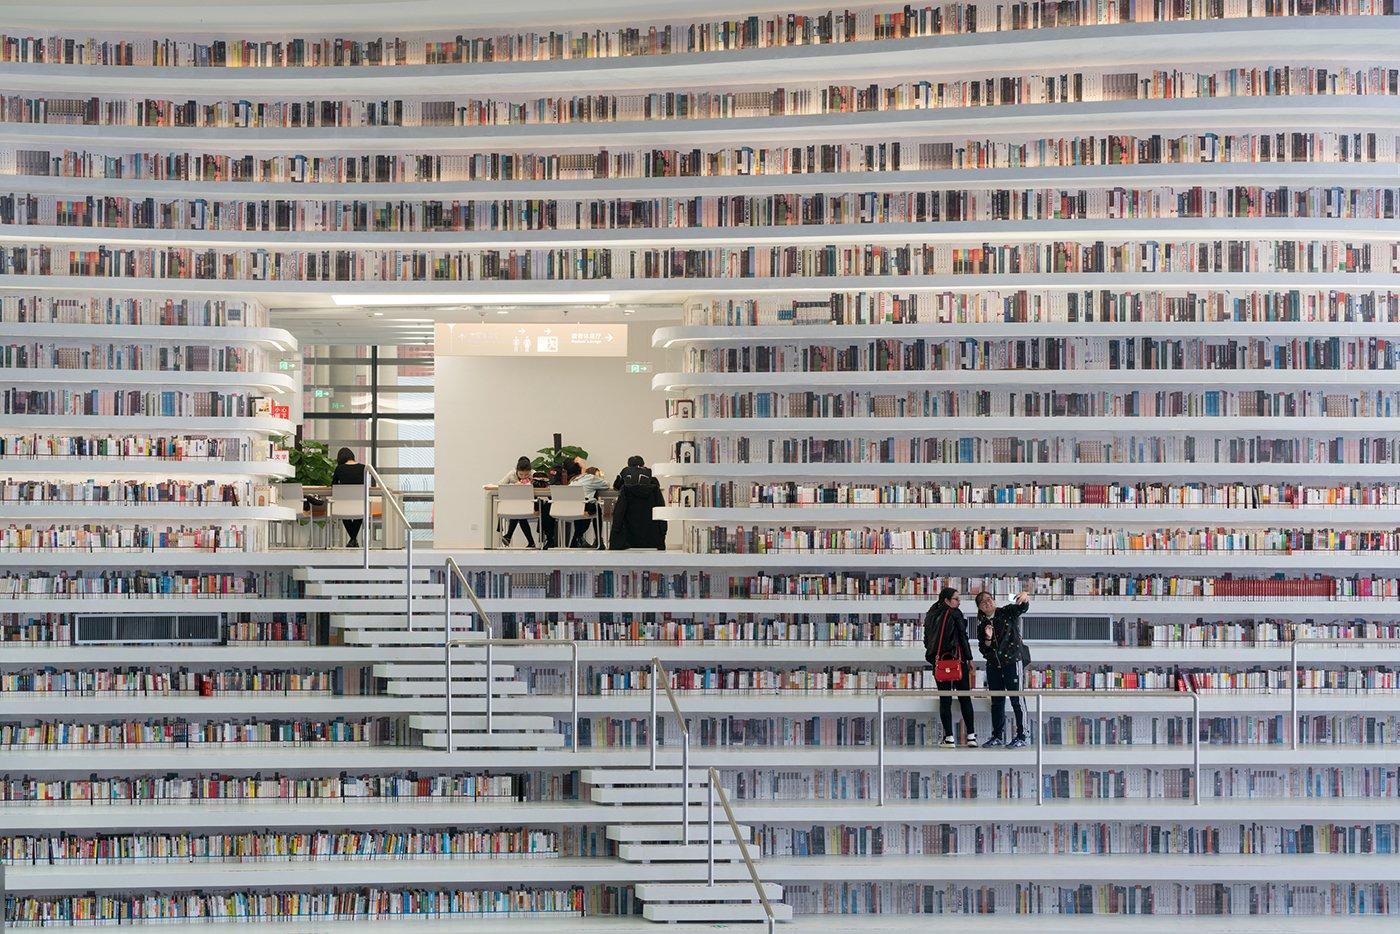 24_Tianjin_Library_∏Ossip_Copy.jpg